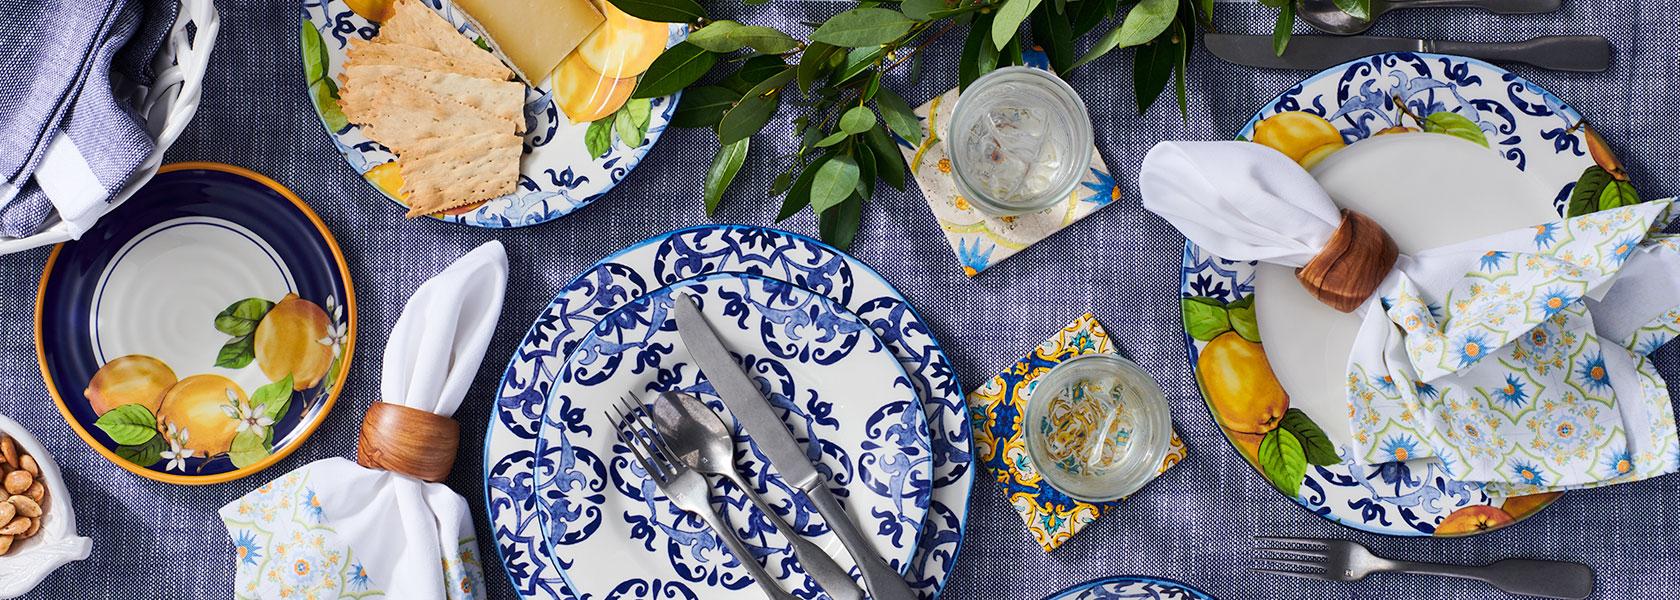 blue and white Limone dinnerware